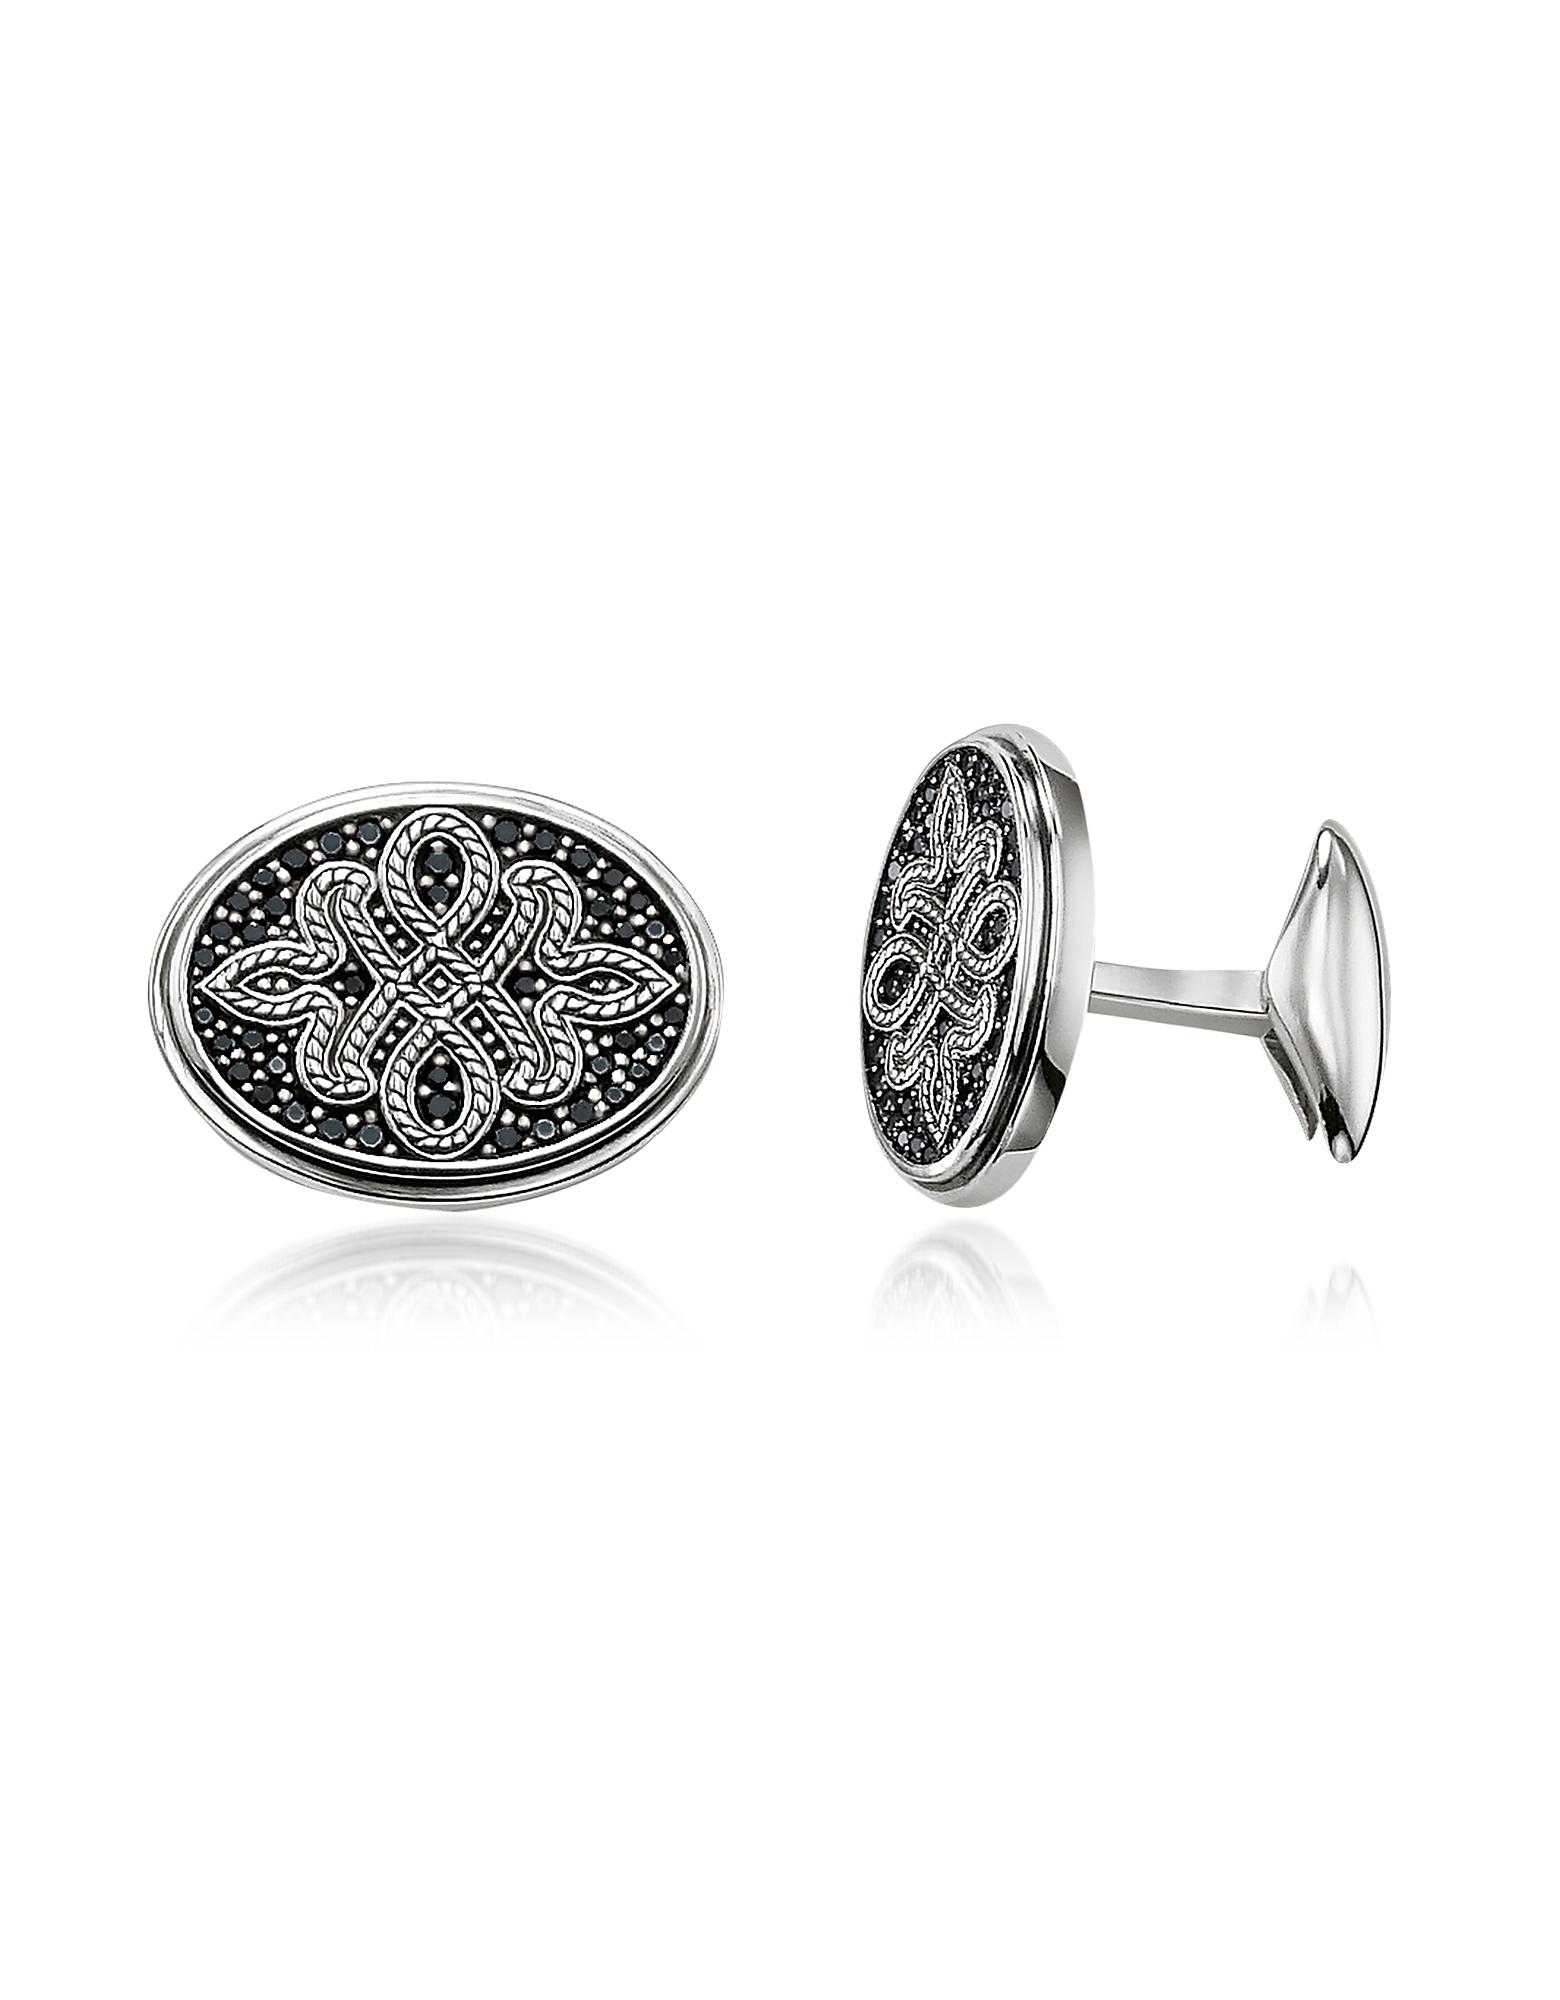 Blackened Sterling silver Love Knot Cufflinks